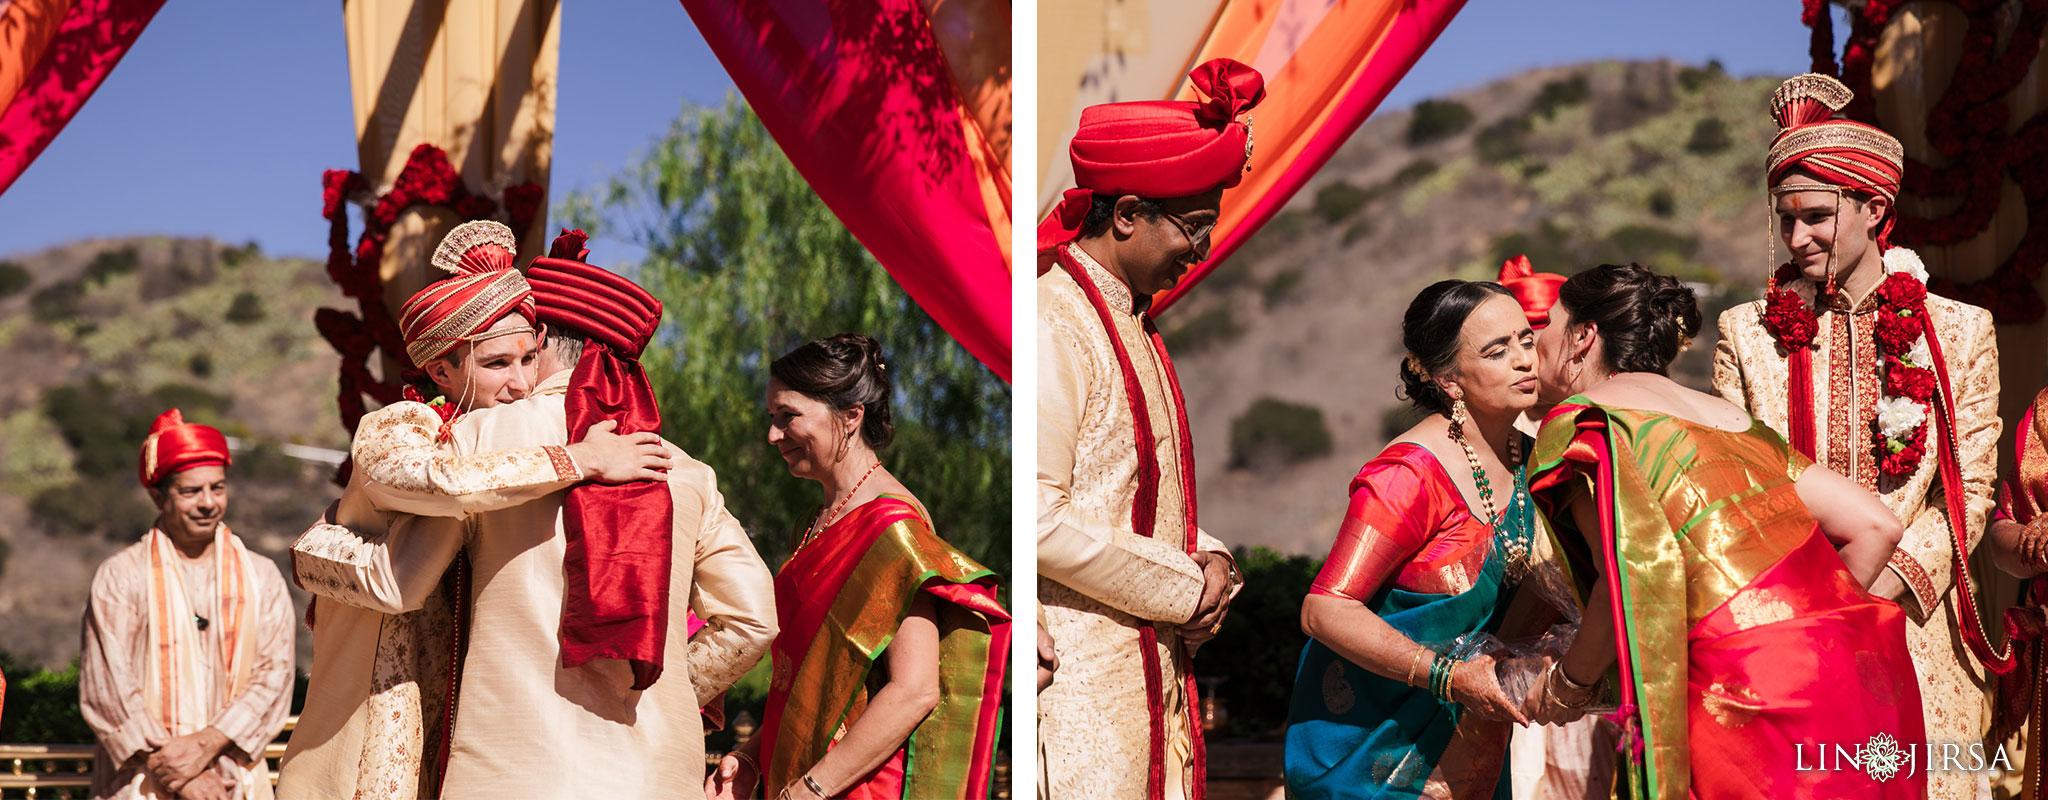 22 Black Gold Golf Course Yorba Linda Indian Wedding Photography